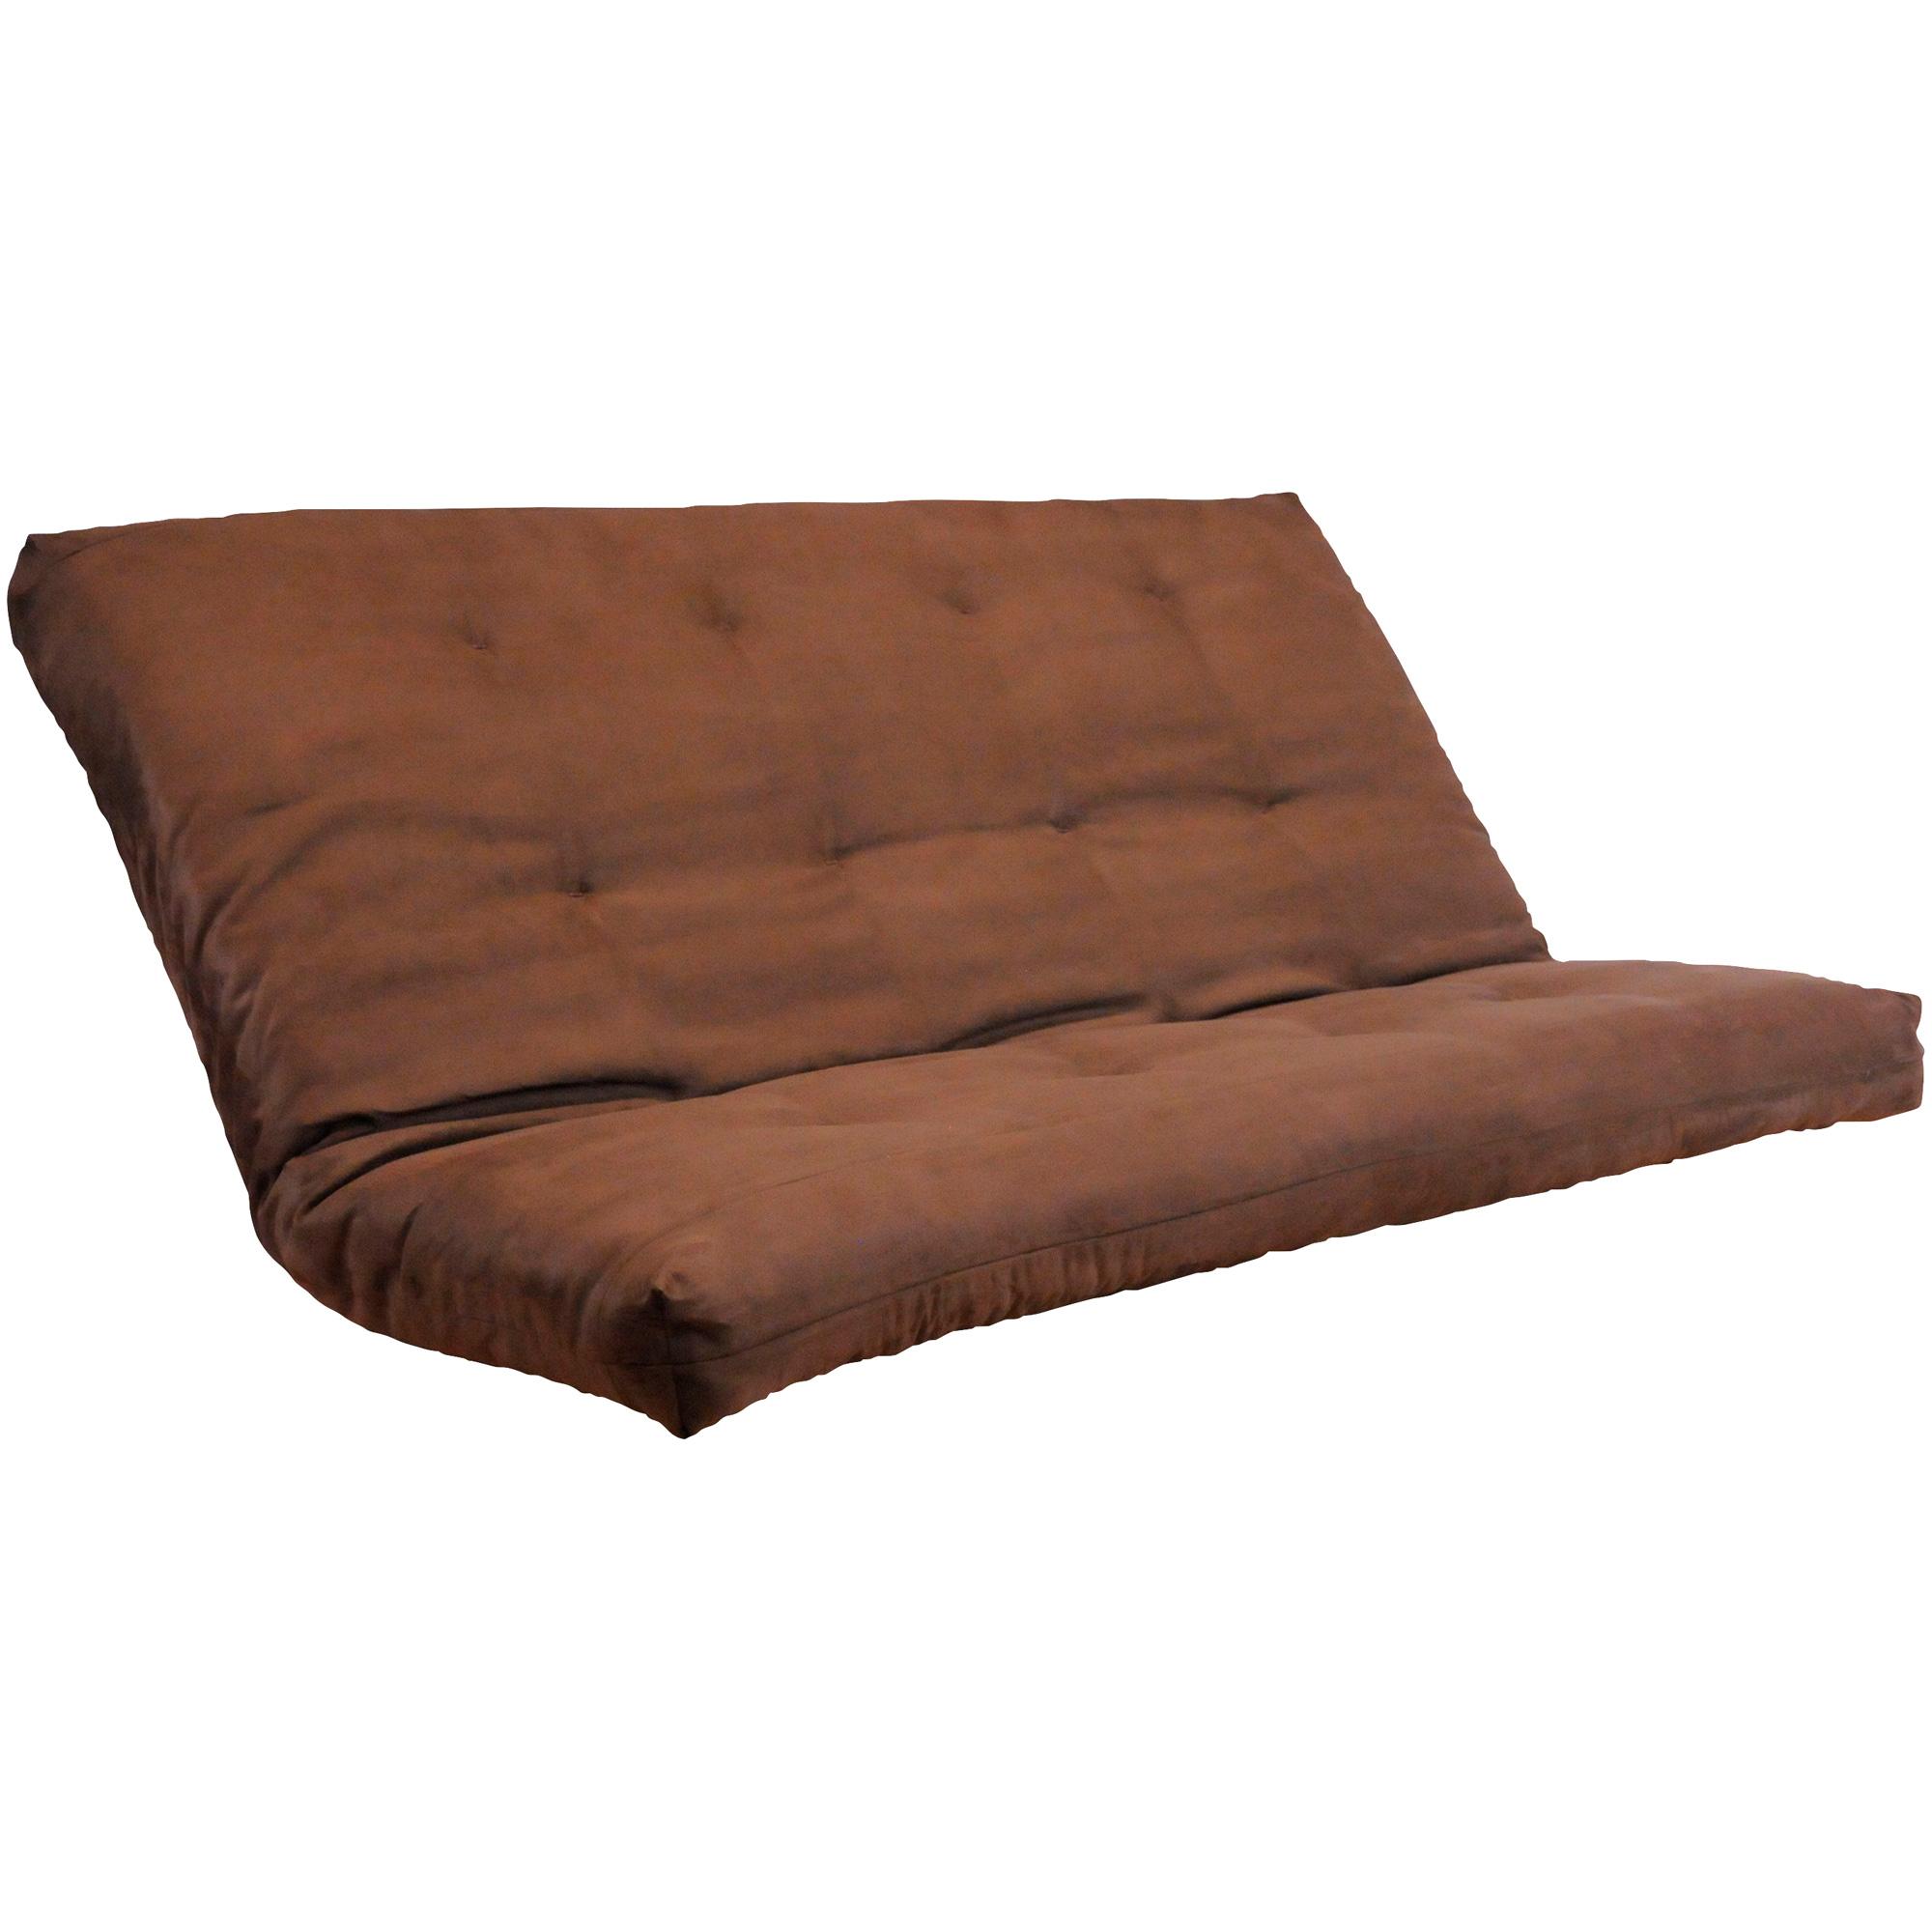 Kodiak Furniture | Microsuede Chocolate Queen Futon Mattress